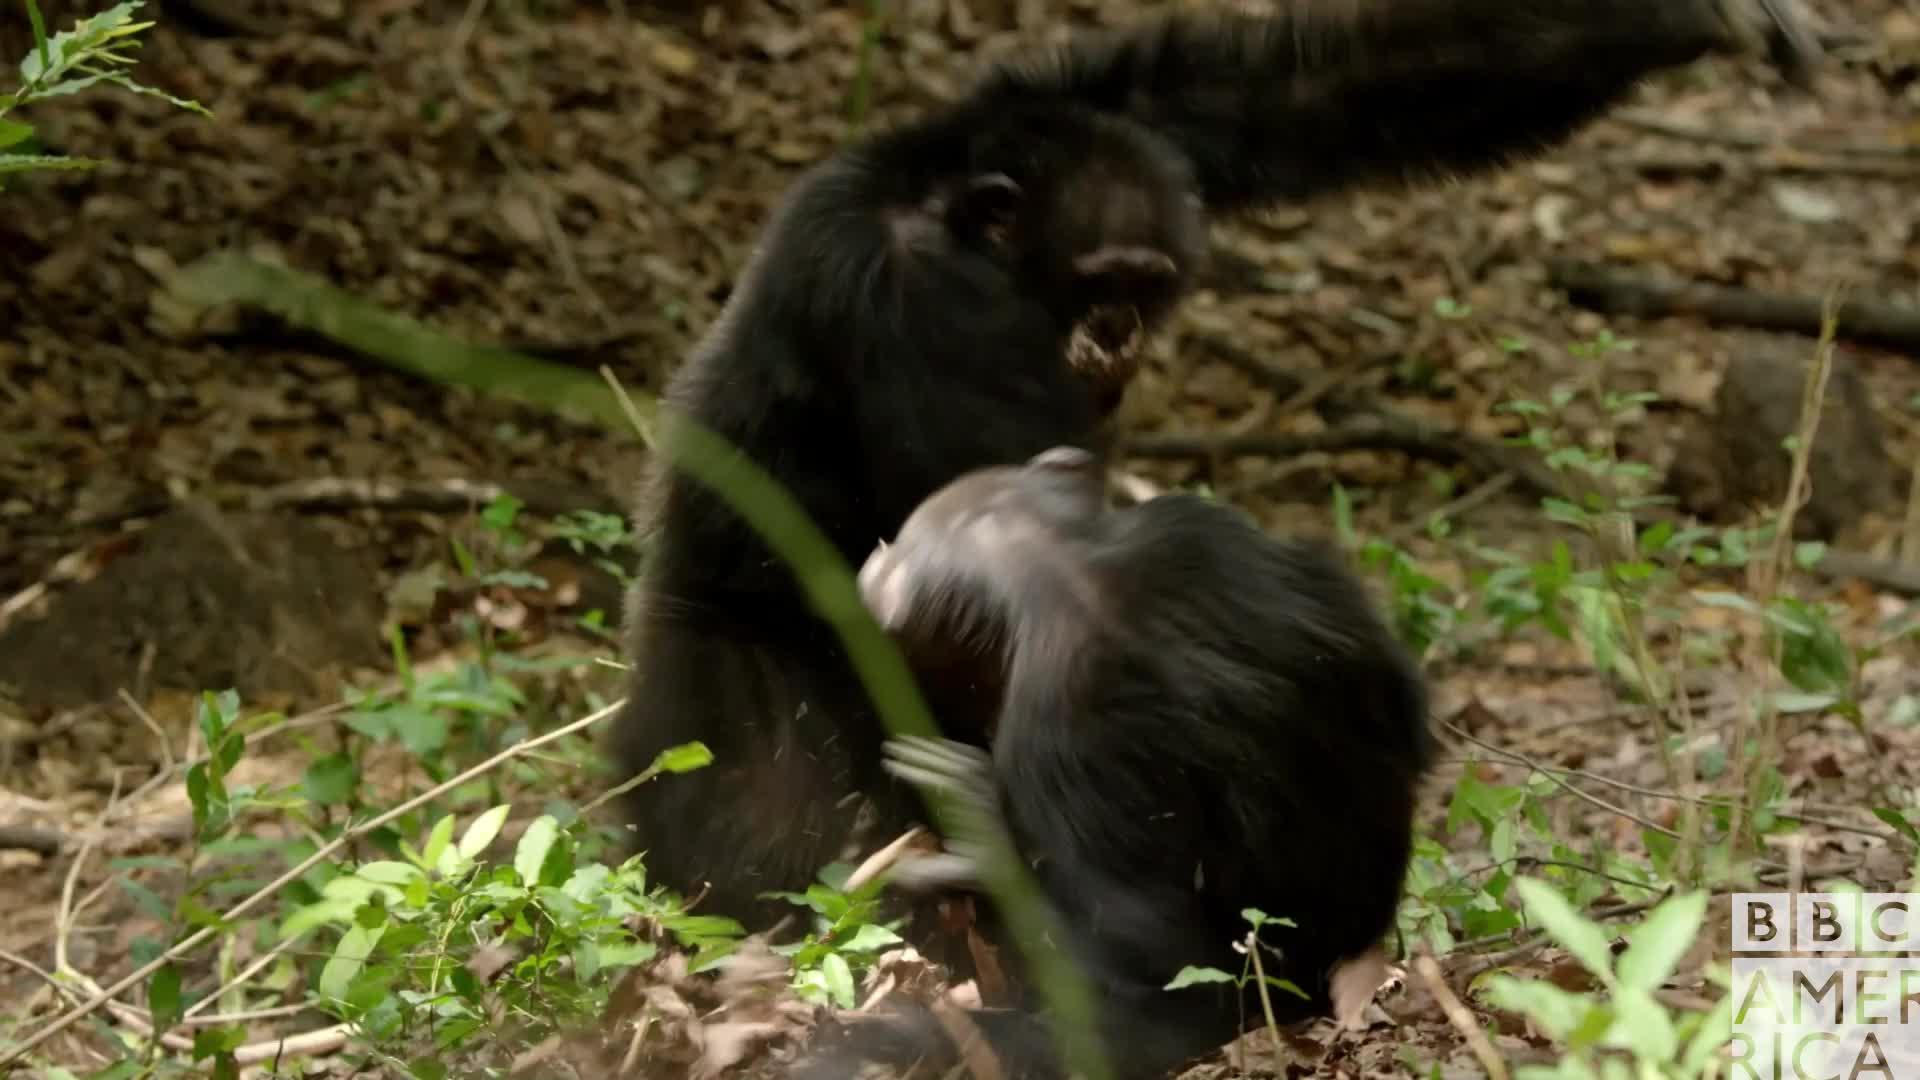 animal, animals, bbc america, bbc america dynasties, bbc america: dynasties, chimp, chimpanzee, chimpanzees, chimps, dynasties, Dynasties Chimp Fight GIFs